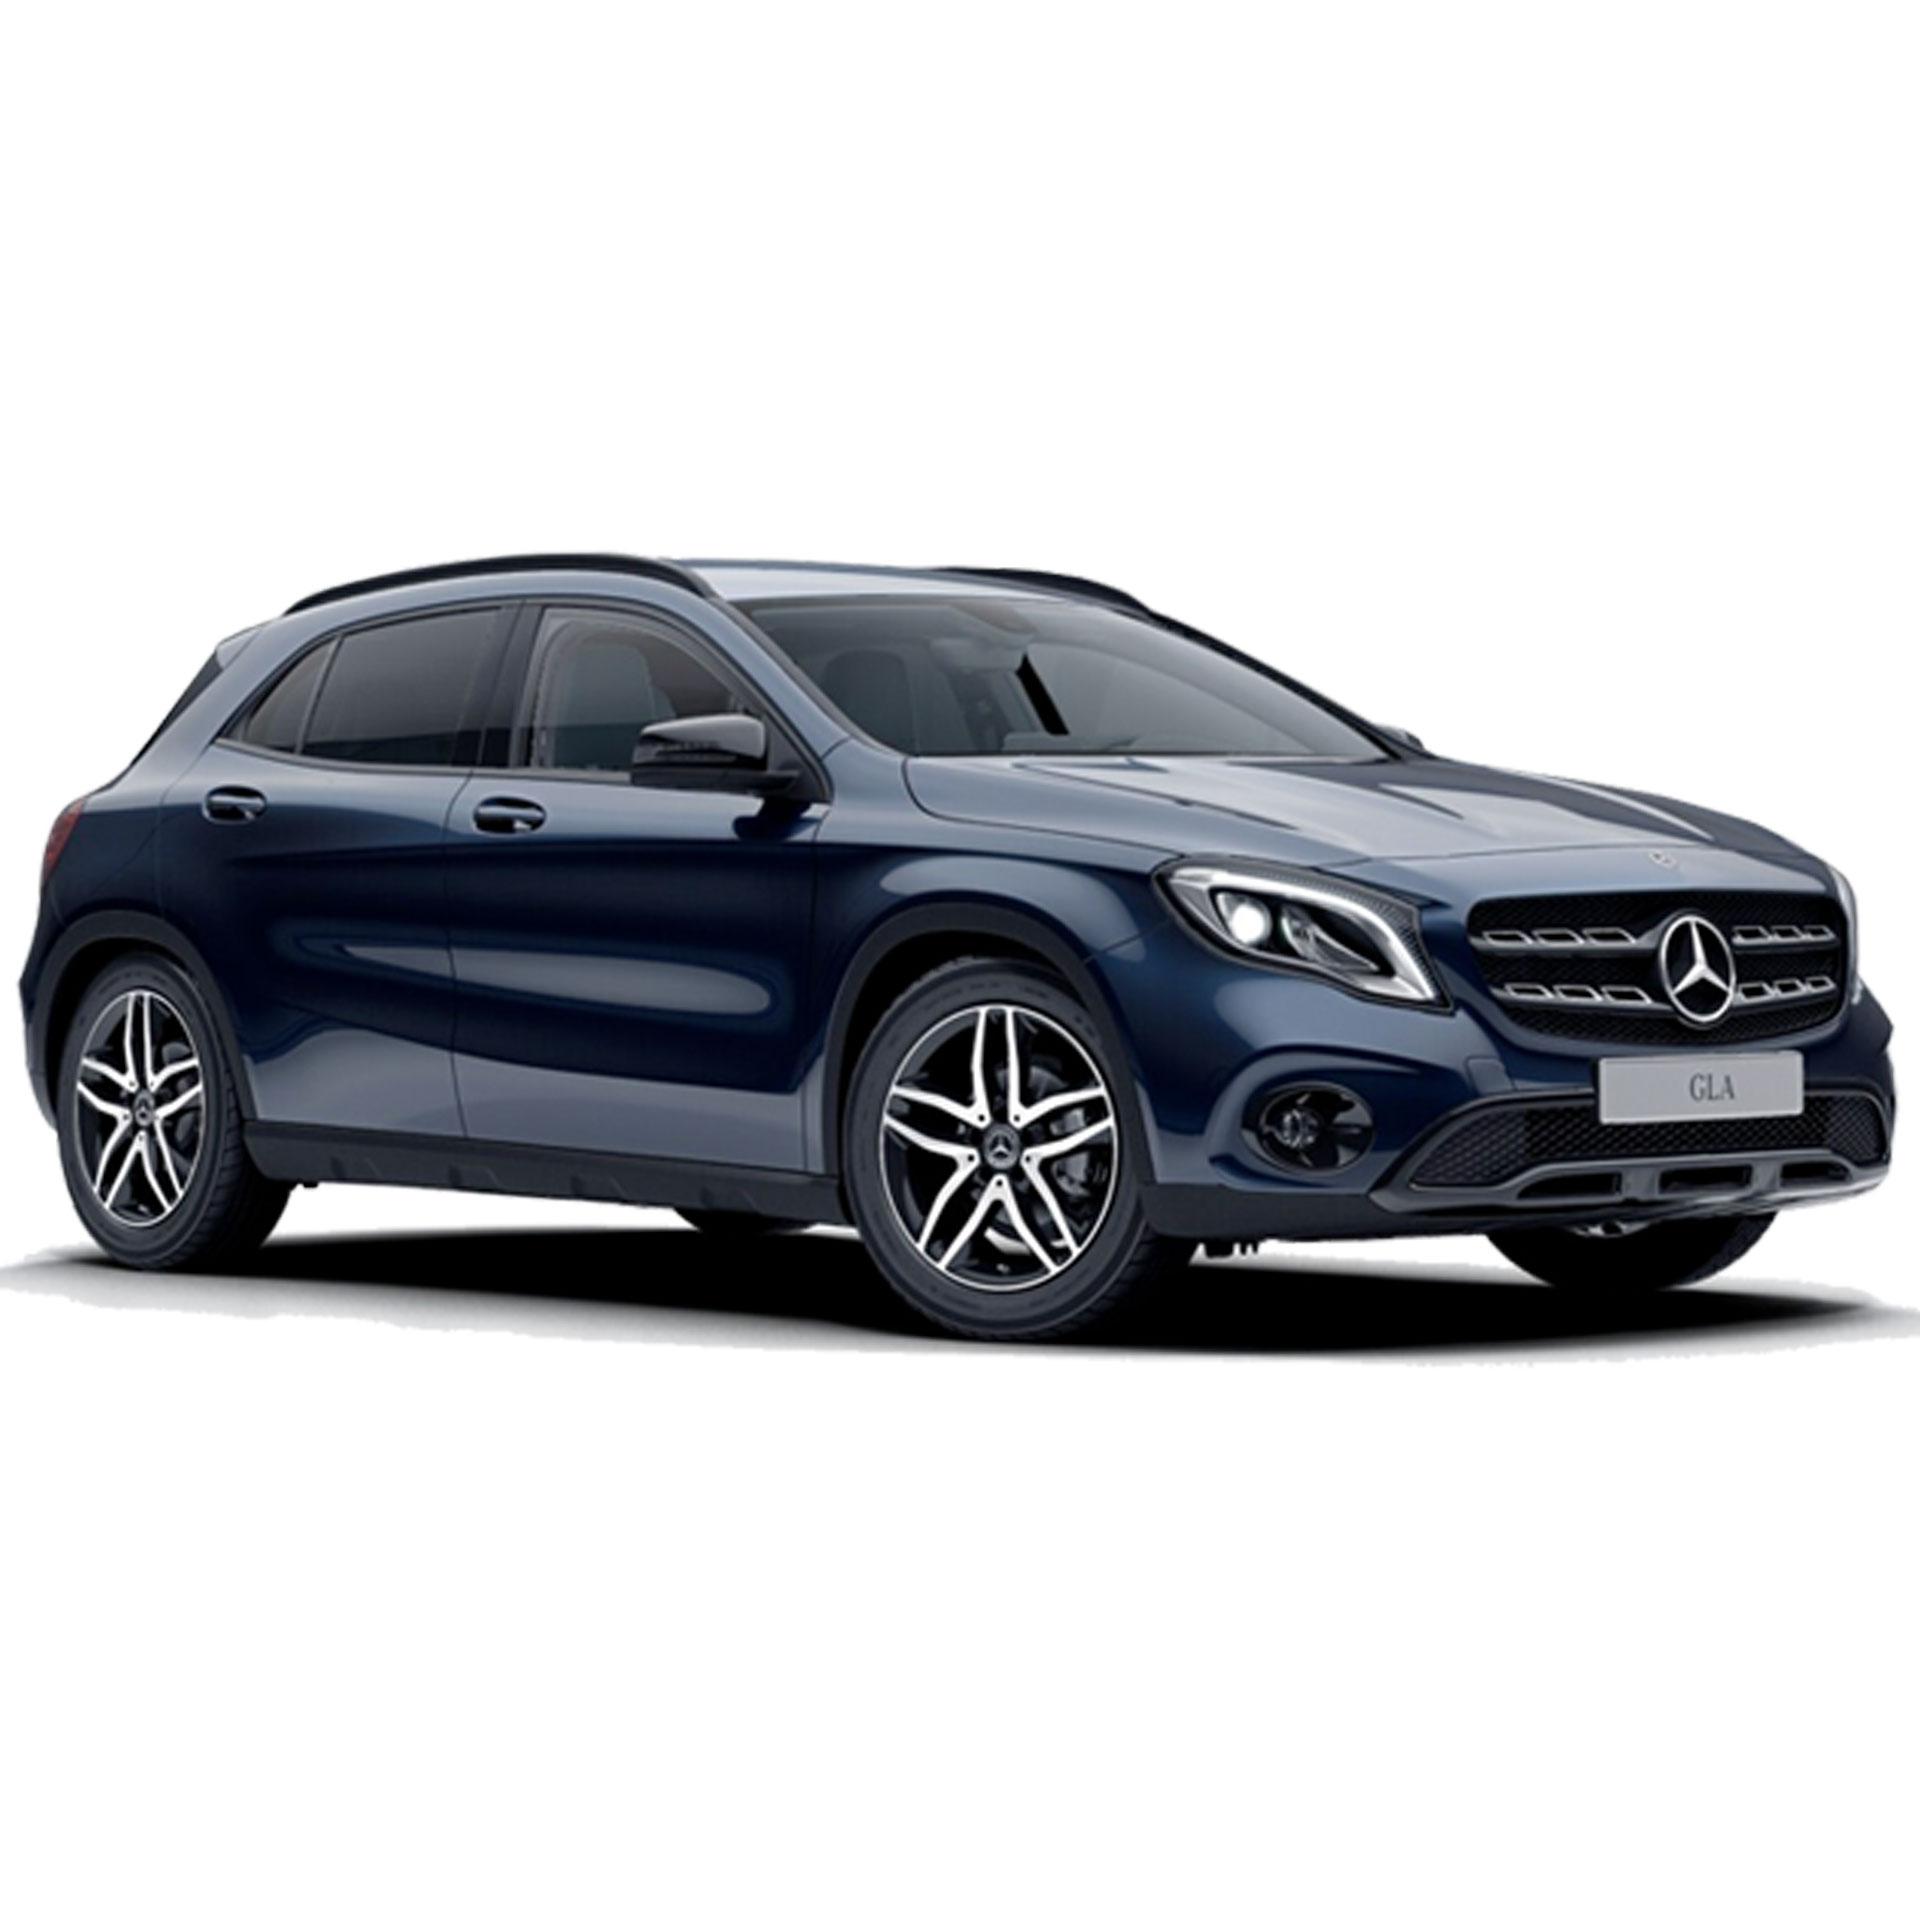 Mercedes GLA Boot Liners (All Models)